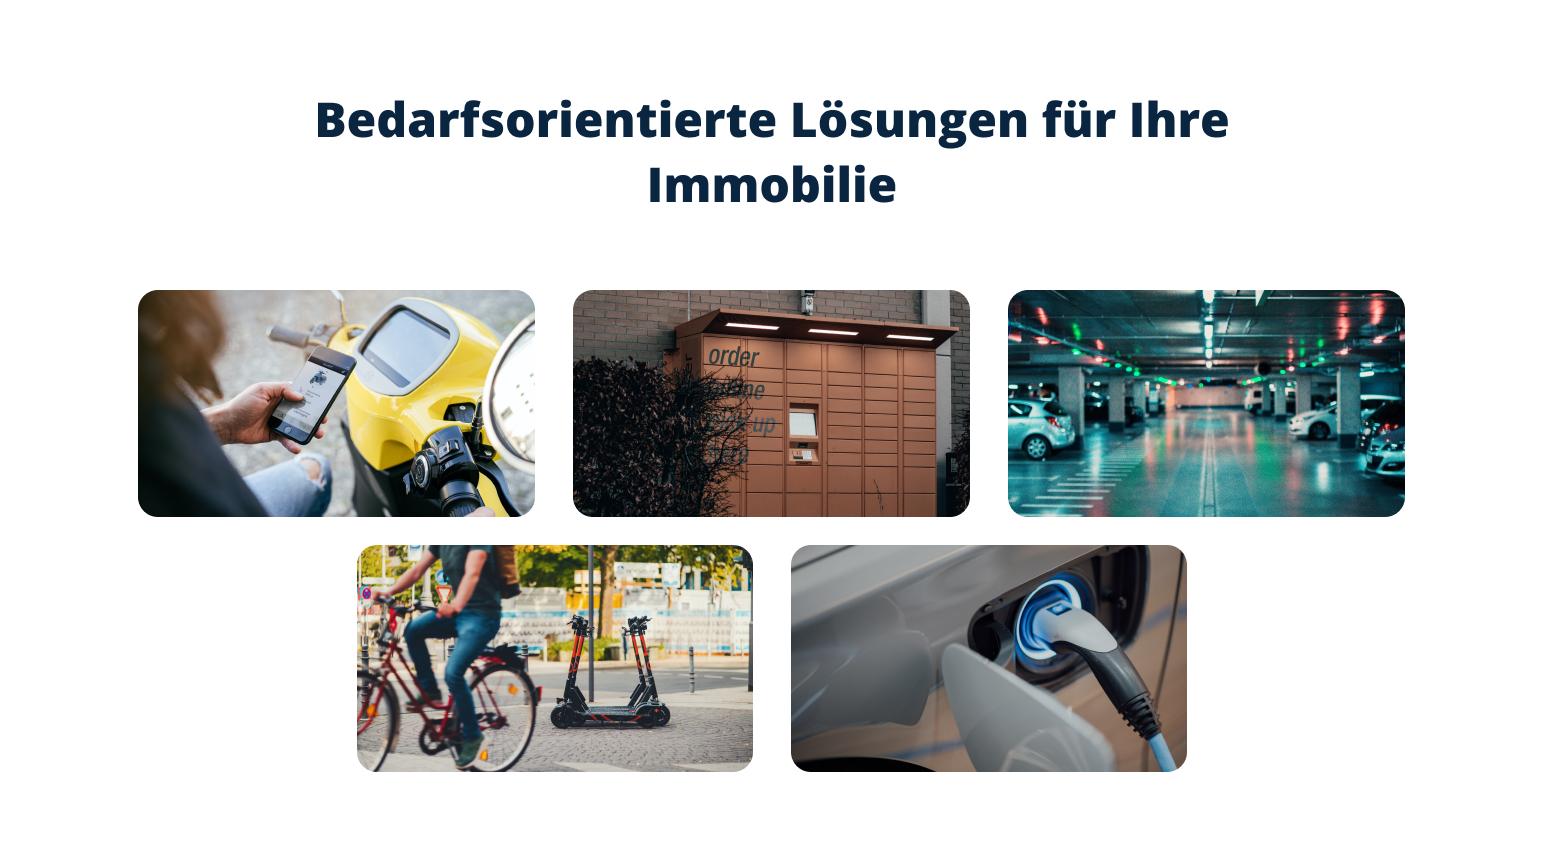 Verschiedene Mobilitätsscenarien